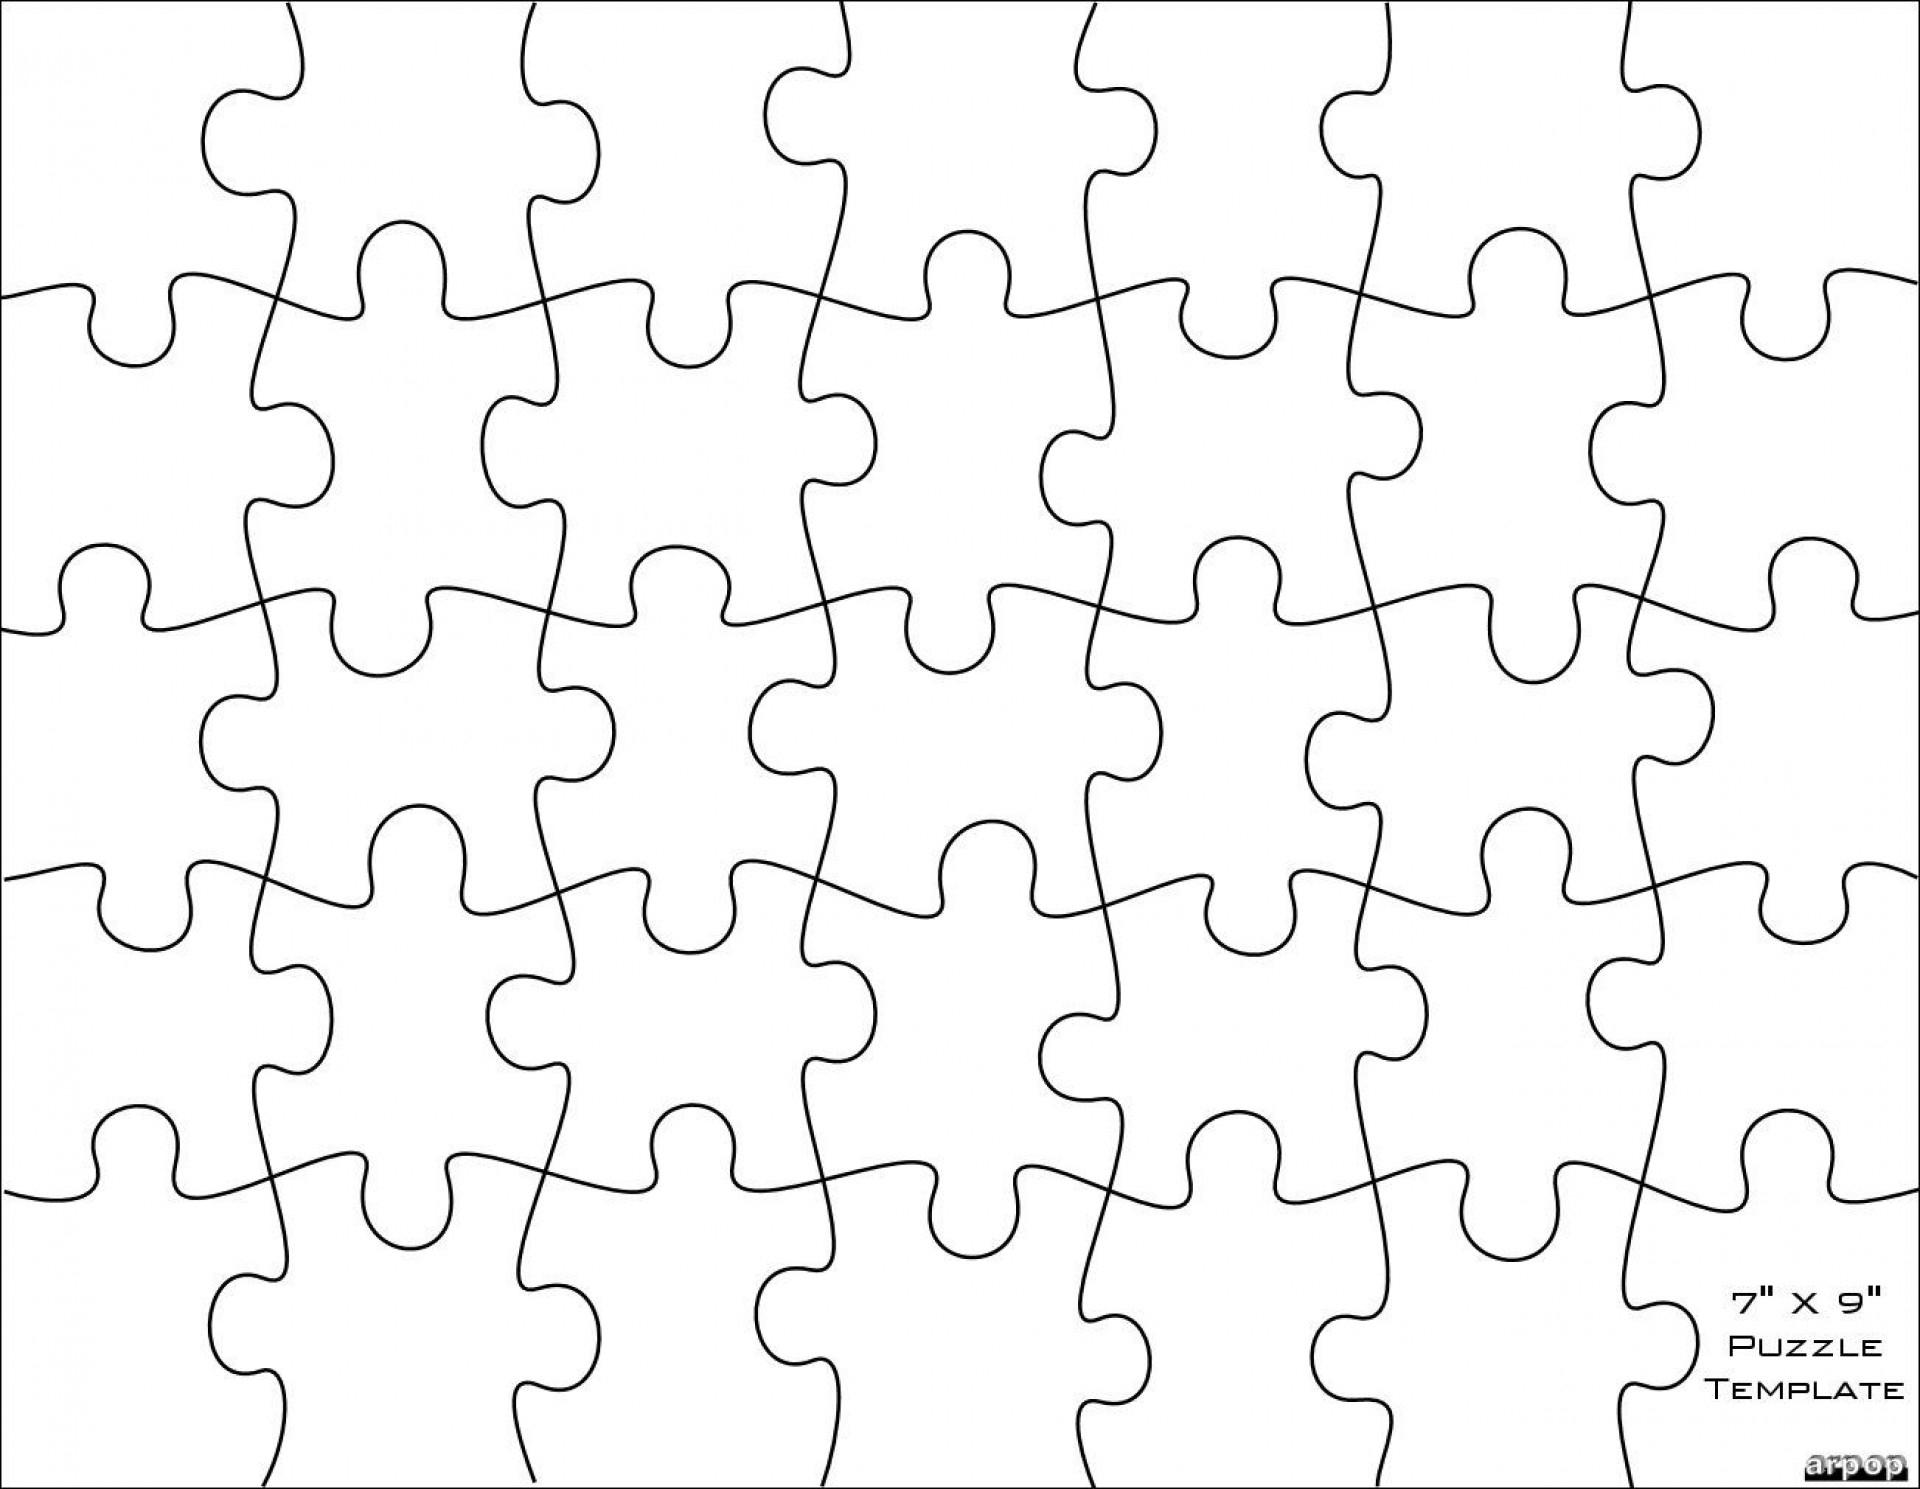 006 Jigsaw Puzzle Blank Template Twenty Pieces Simple Jig Saw - Printable Jigsaw Puzzle Maker